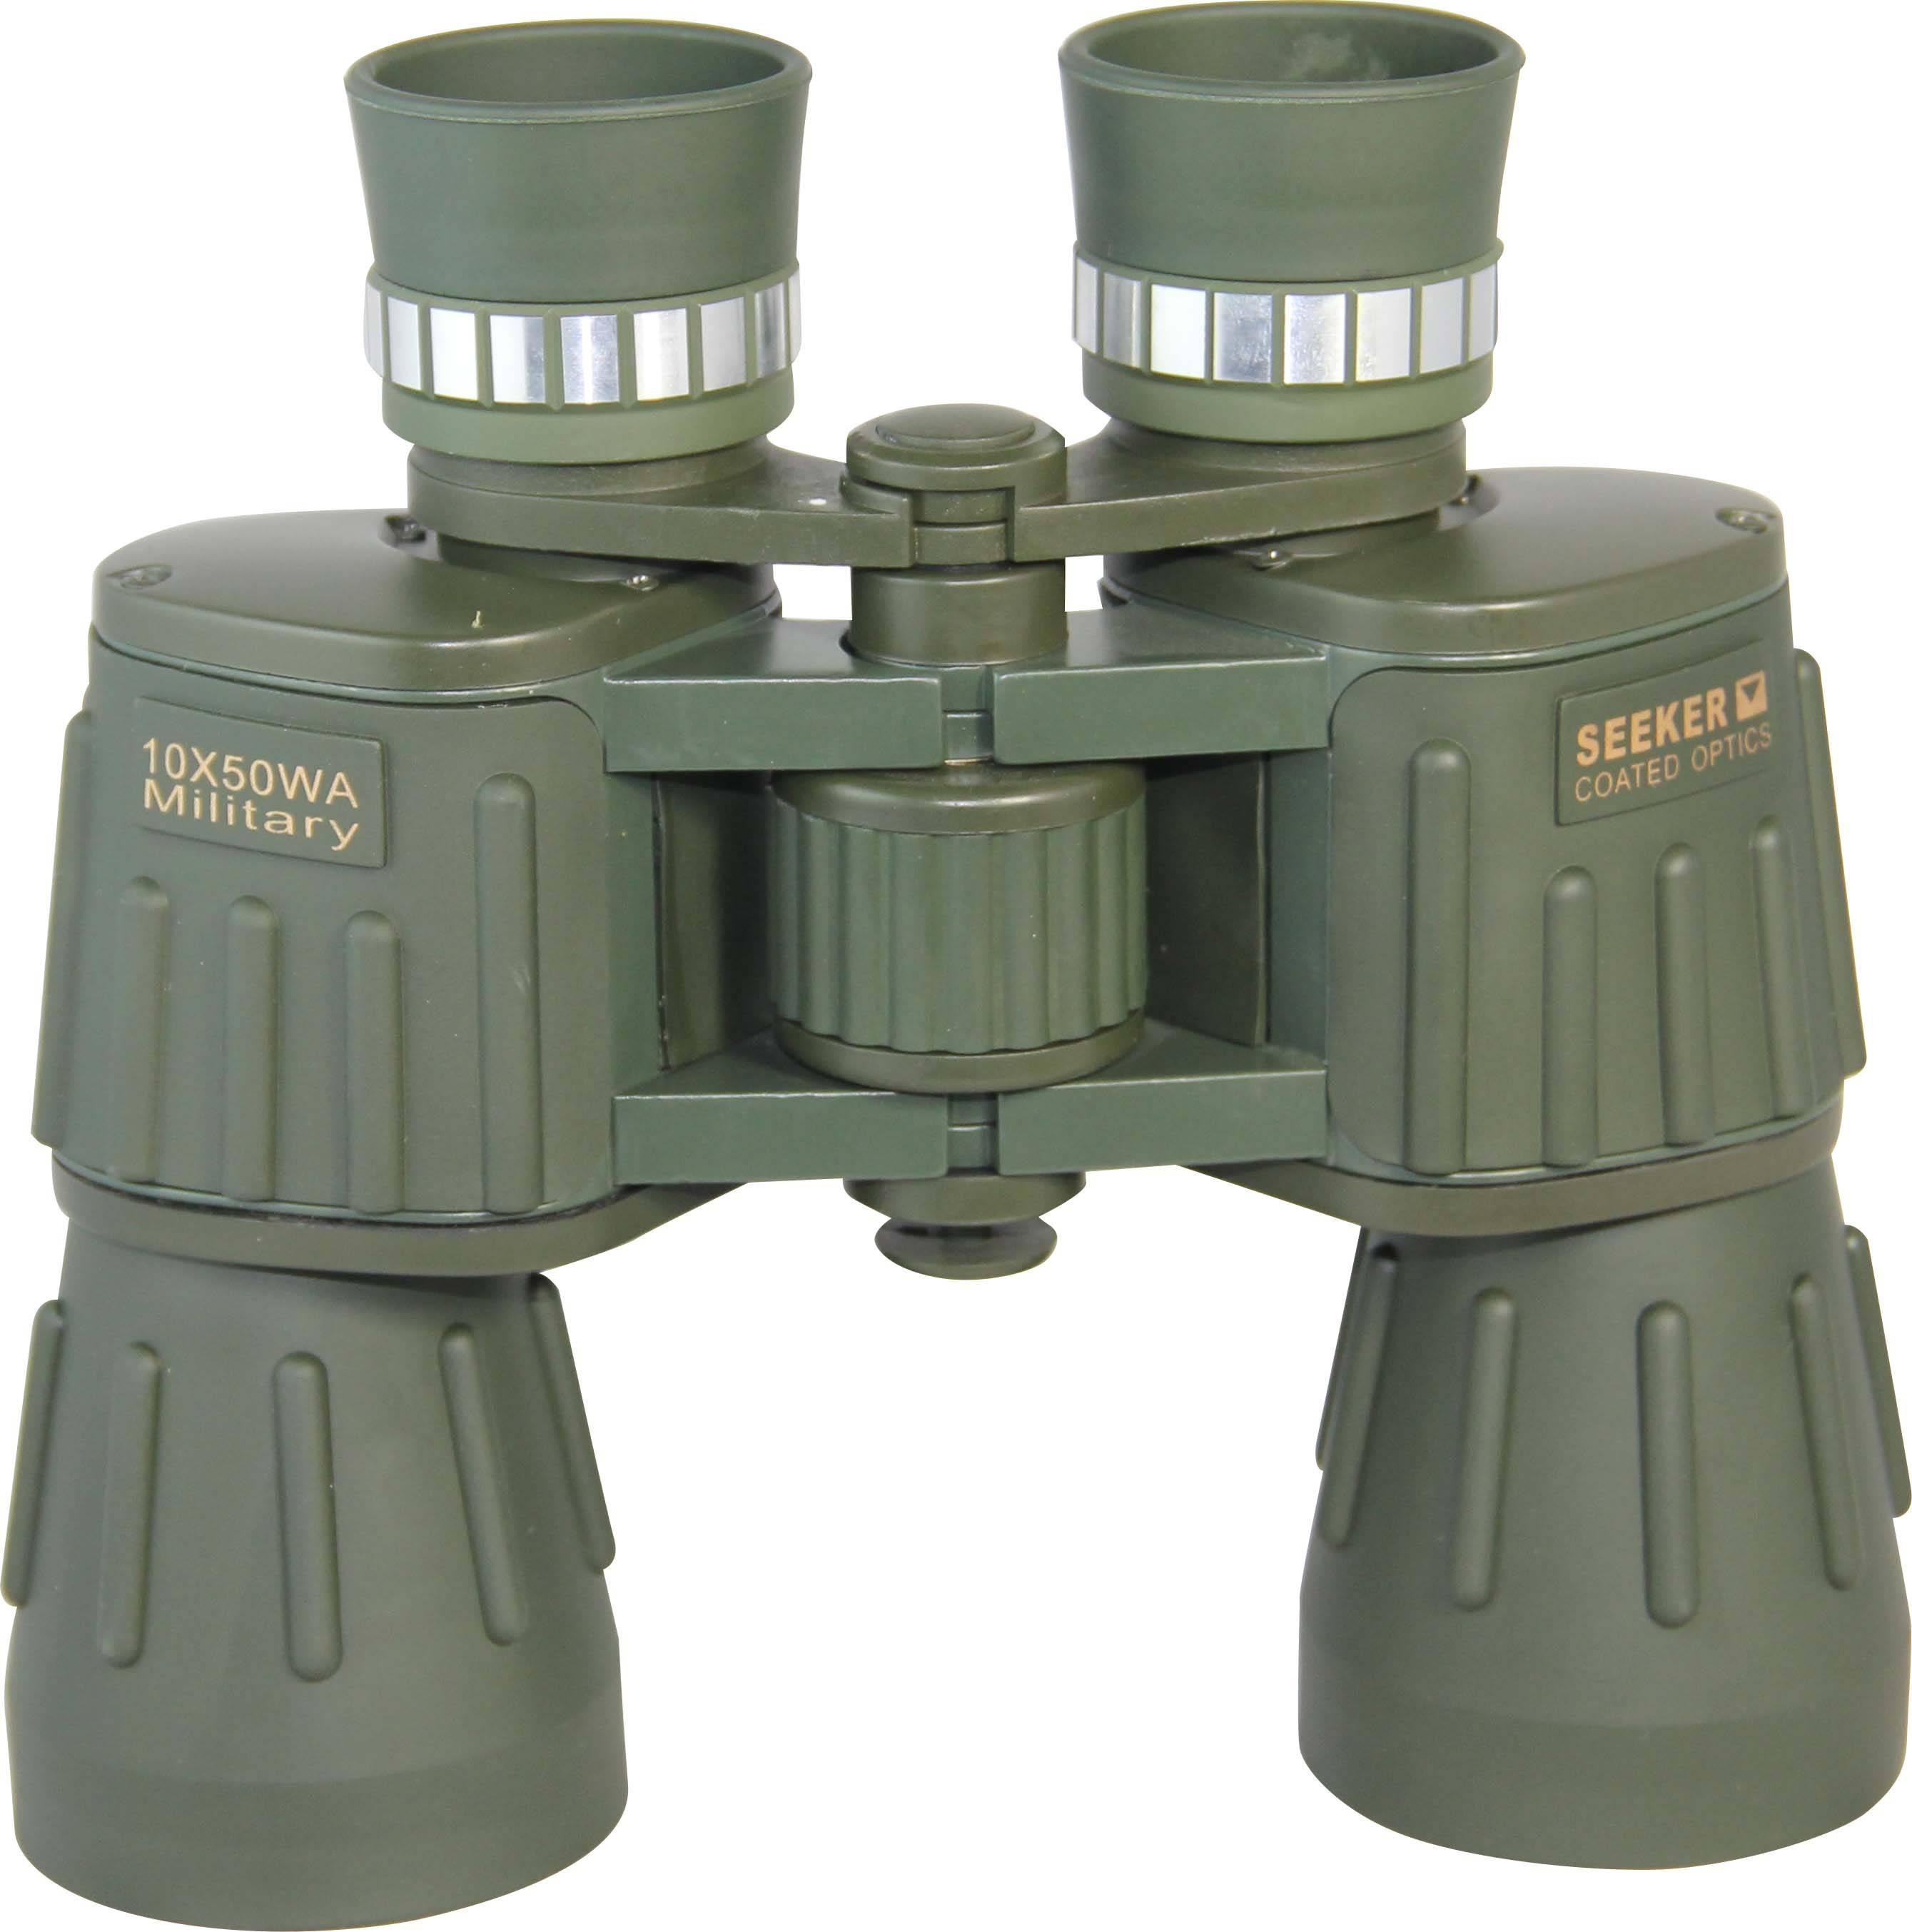 (BM-5003) 7X50 wide angle marine waterproof outdoor binoculars